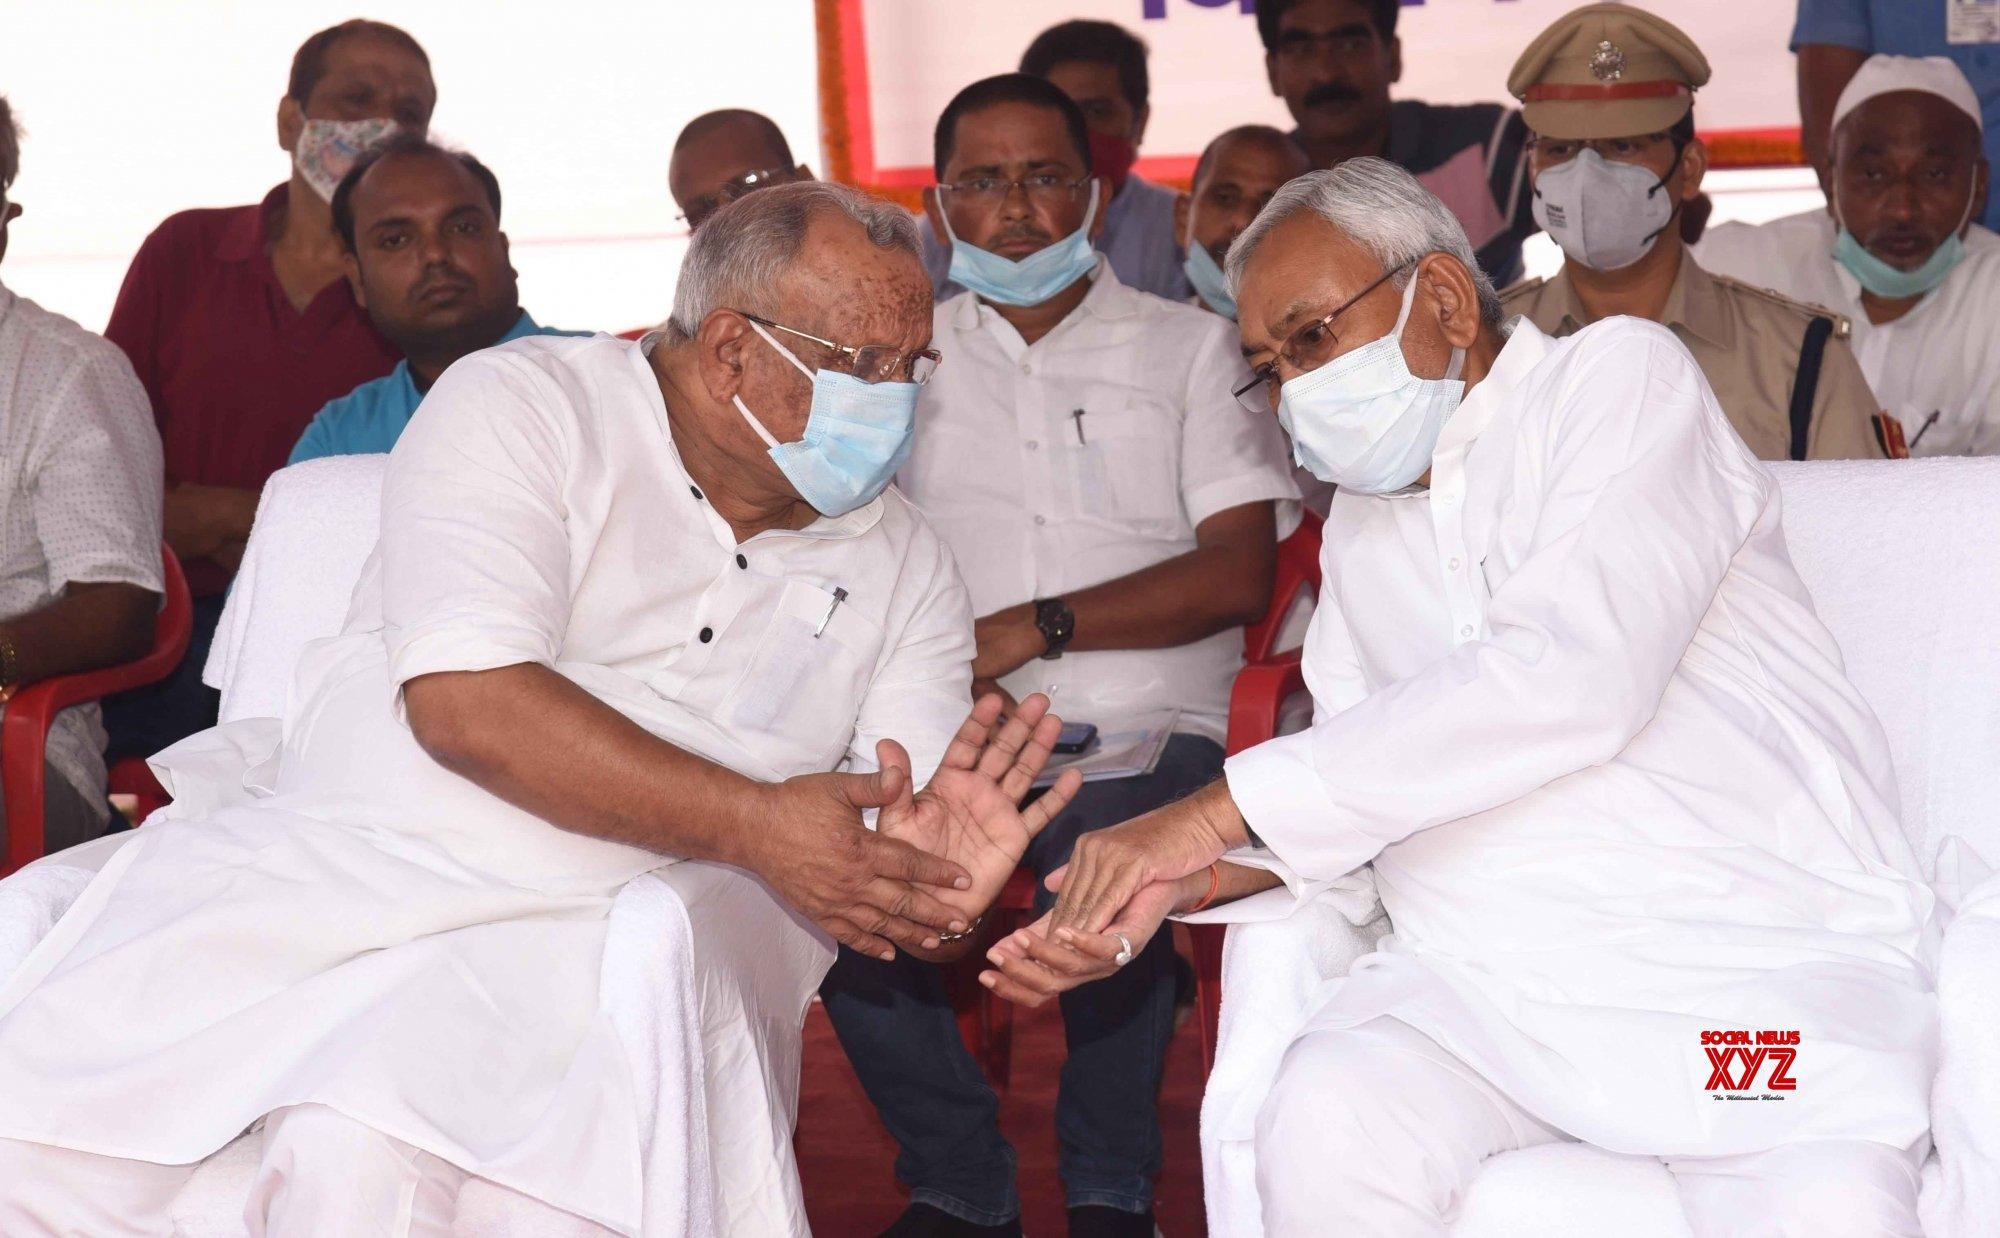 Patna: Bihar Chief Minister Nitish Kumar with Governor Fagu Chouhan on the death anniversary of veteran leader Dr. Ram Manohar Lohia in Patna #Gallery